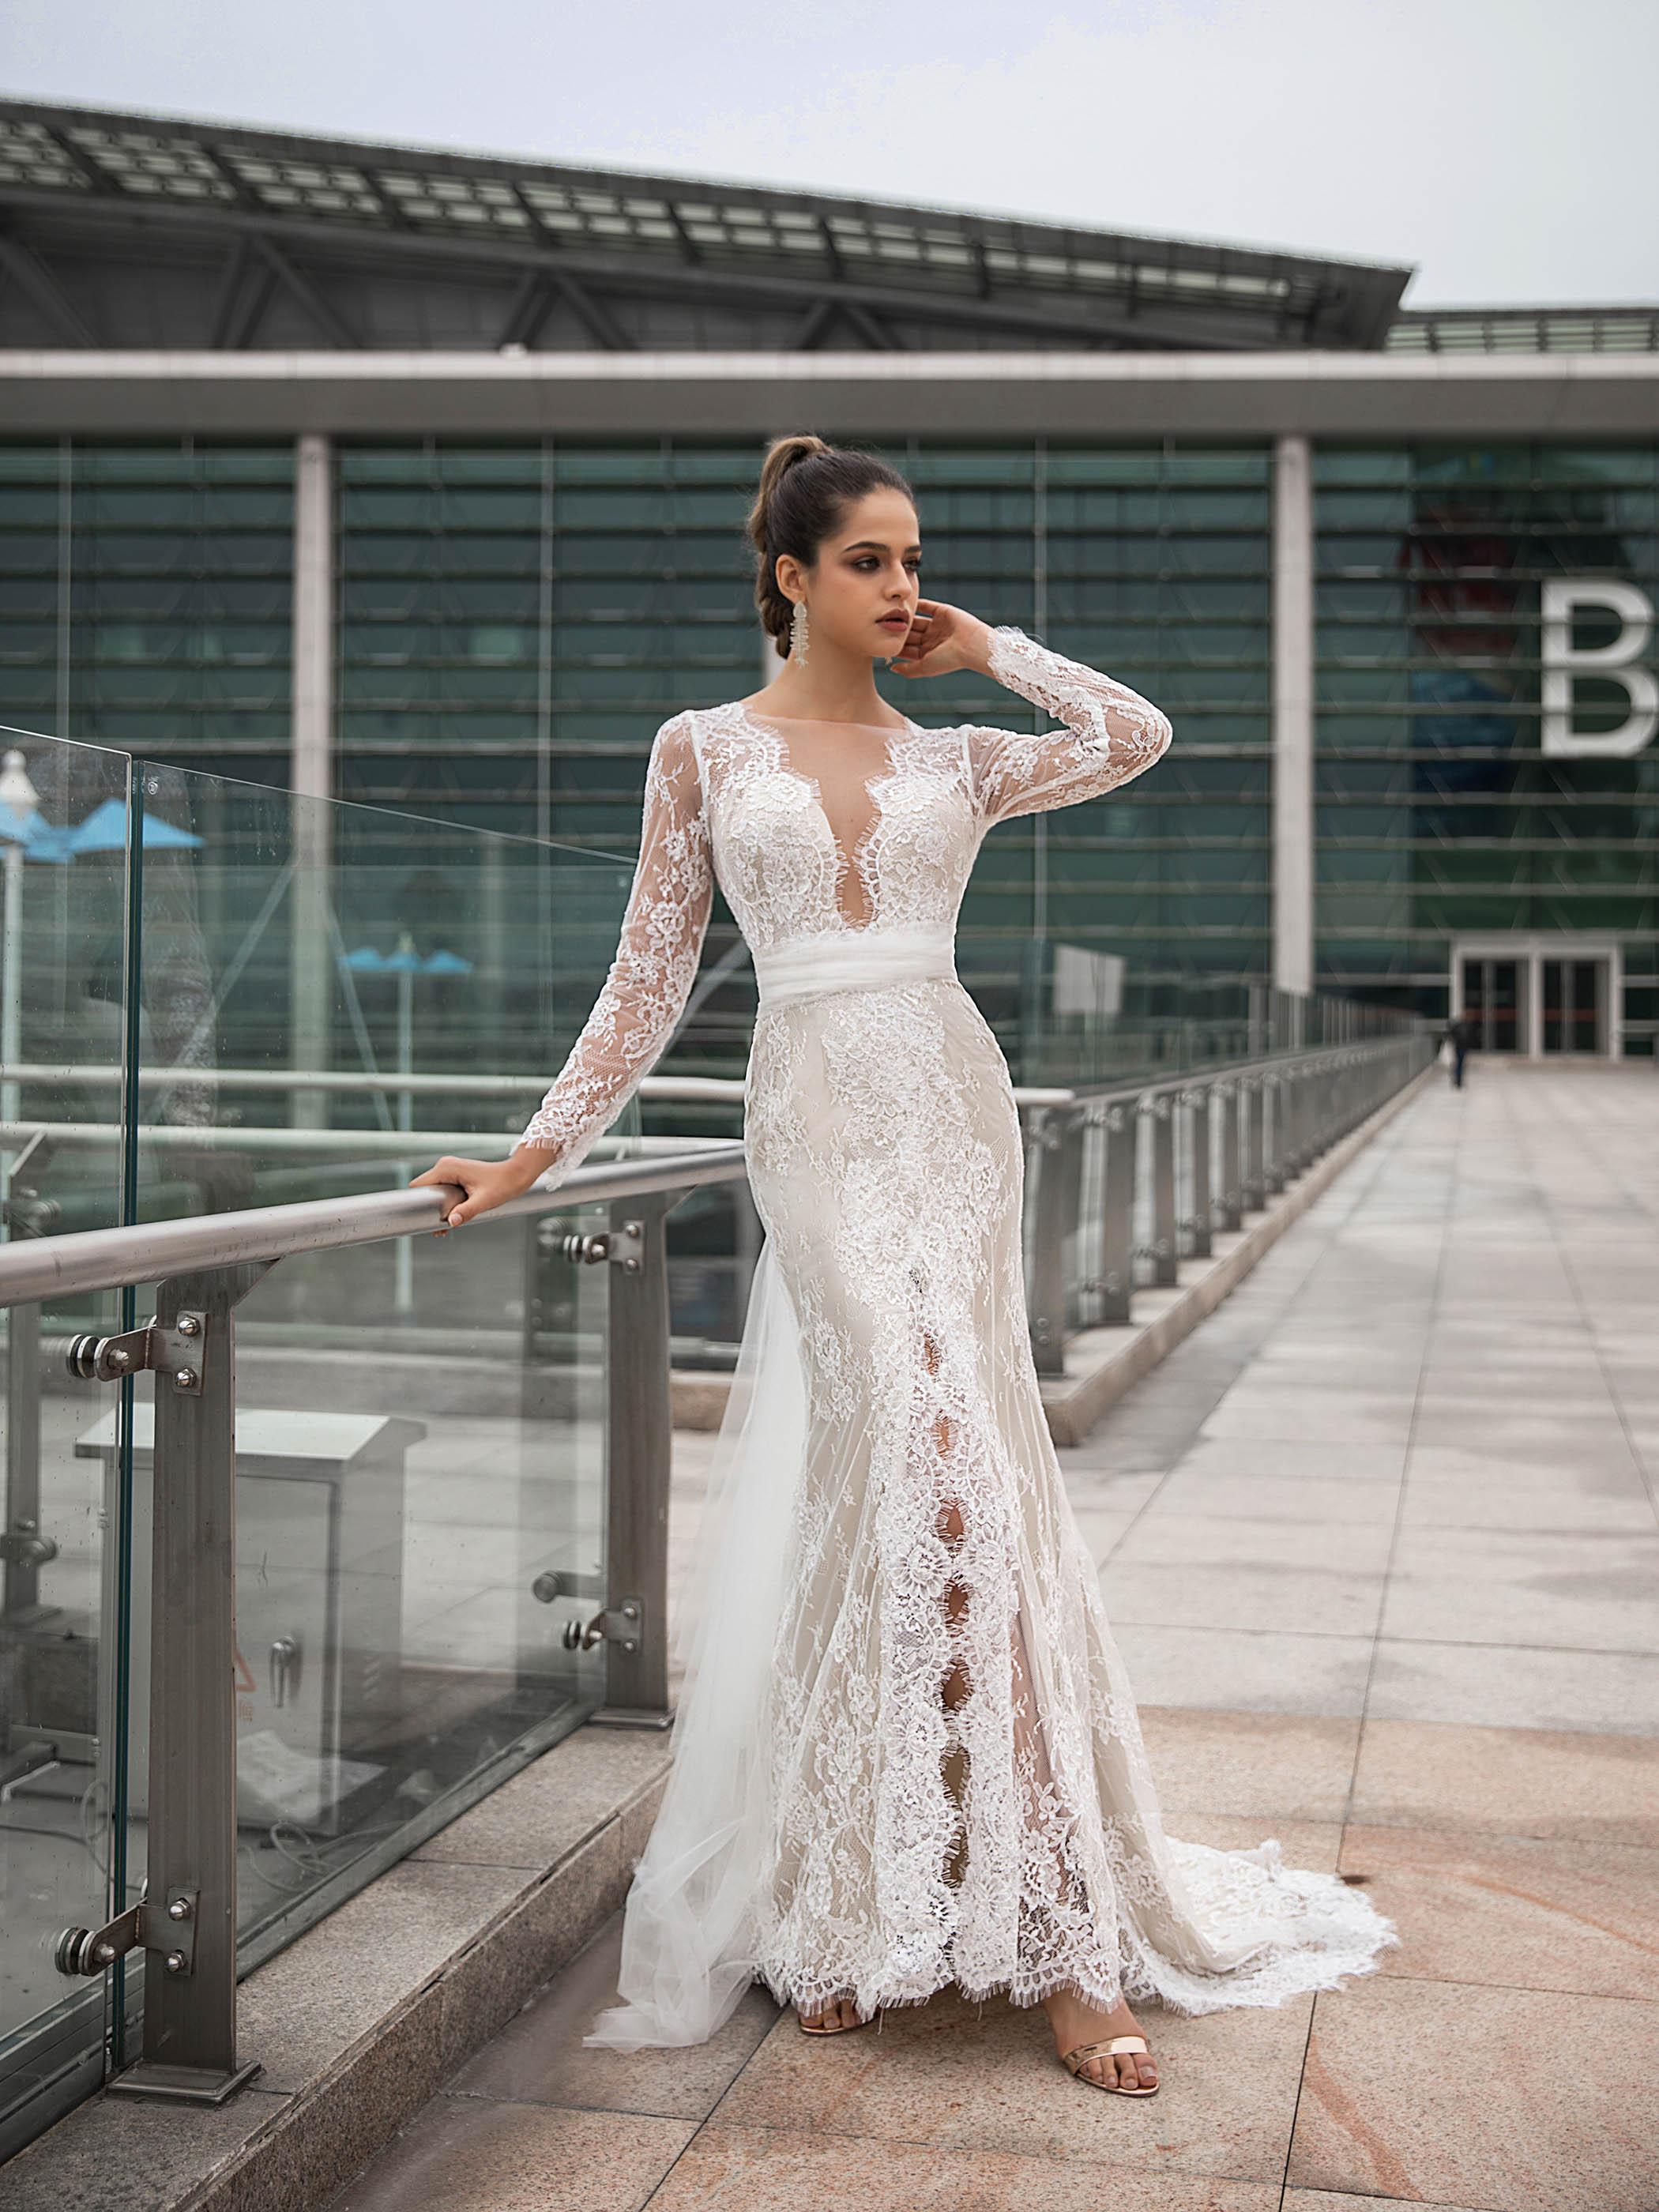 Tanpell Elegant Lace Mermaid Wedding Dress Long Sleeves Backless  Sashes Court Train Simple Garden Gown Custom Wedding Dress 202